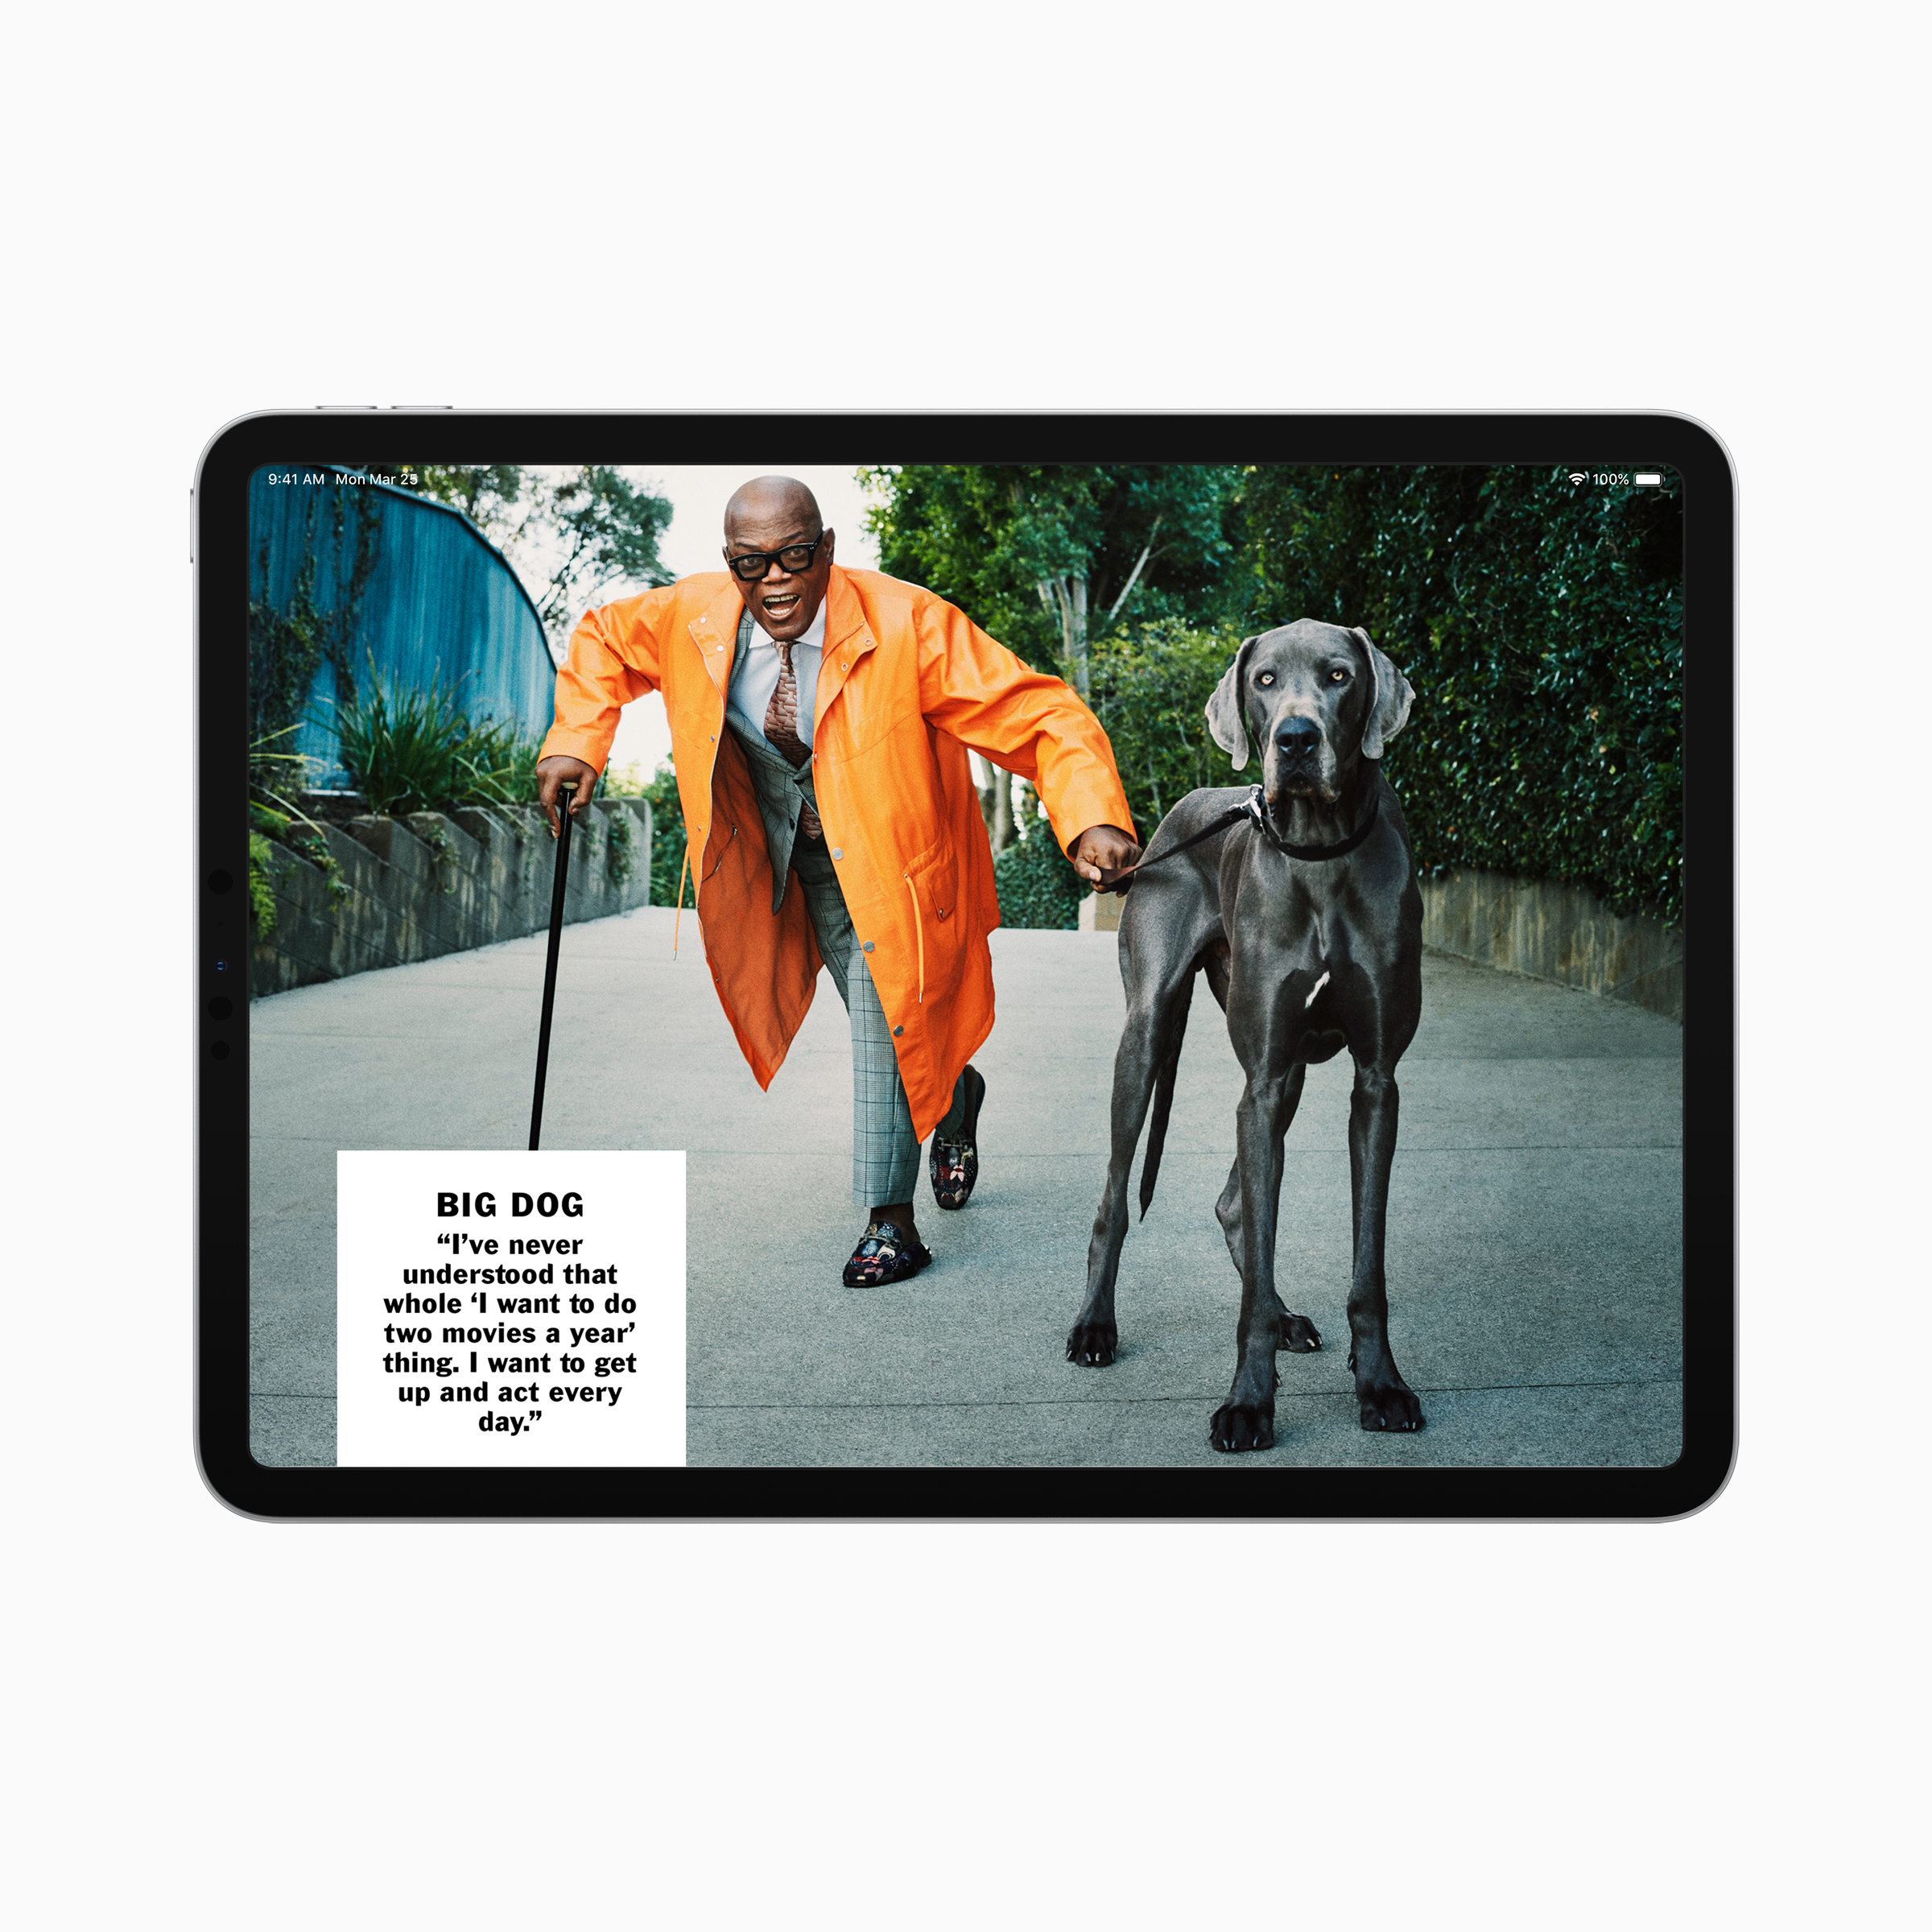 Apple-news-plus-esquire-ipad-screen-03252019.jpg